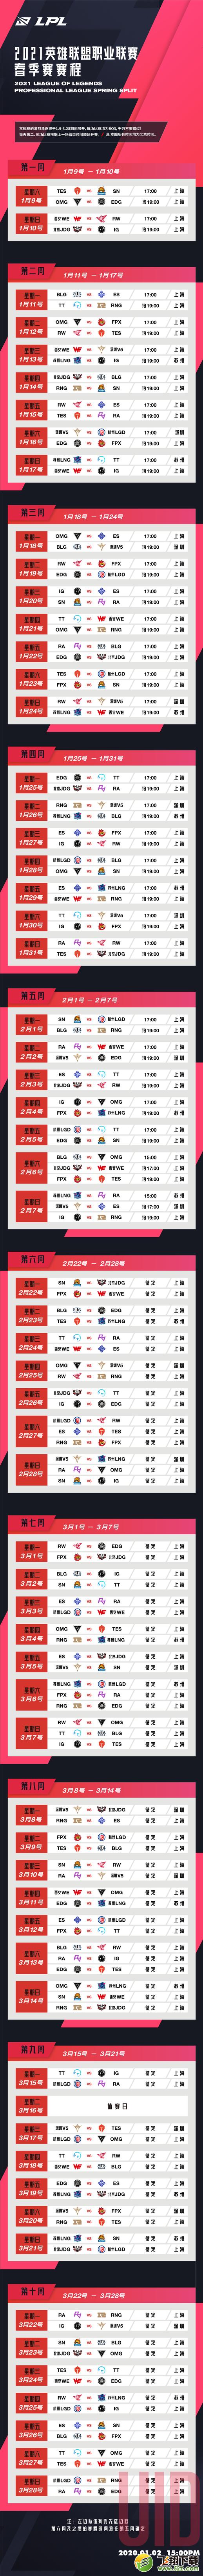 2021LPL春季赛赛程图一览_52z.com